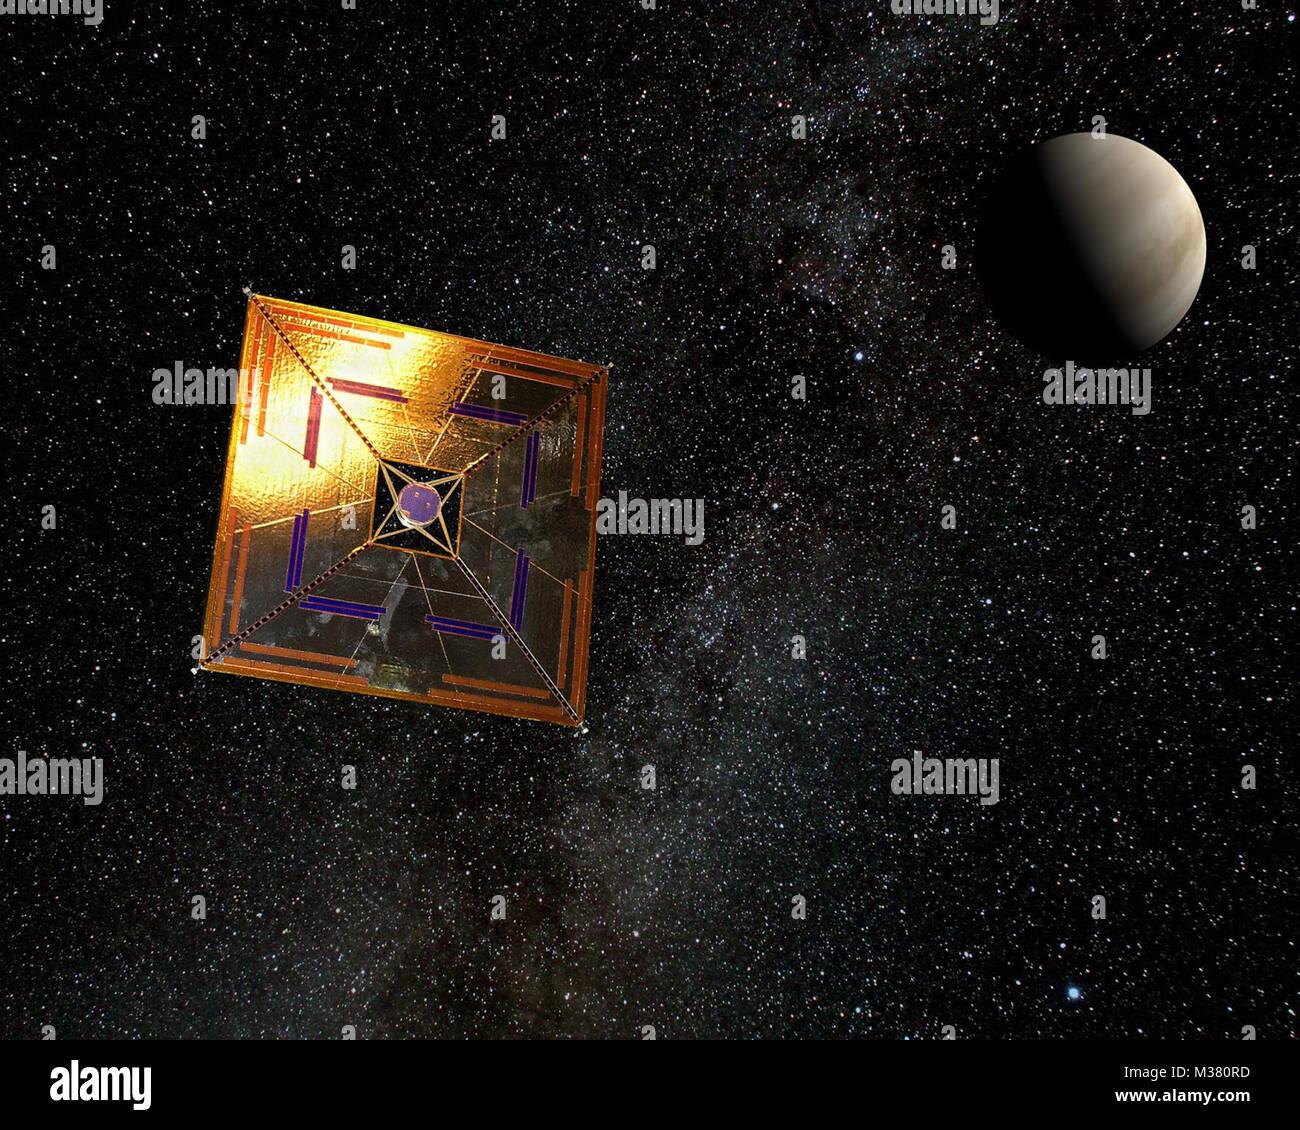 Artist's rendering of the IKAROS spaceprobe in flight. IKAROS (Interplanetary Kite-craft Accelerated by Radiation - Stock Image